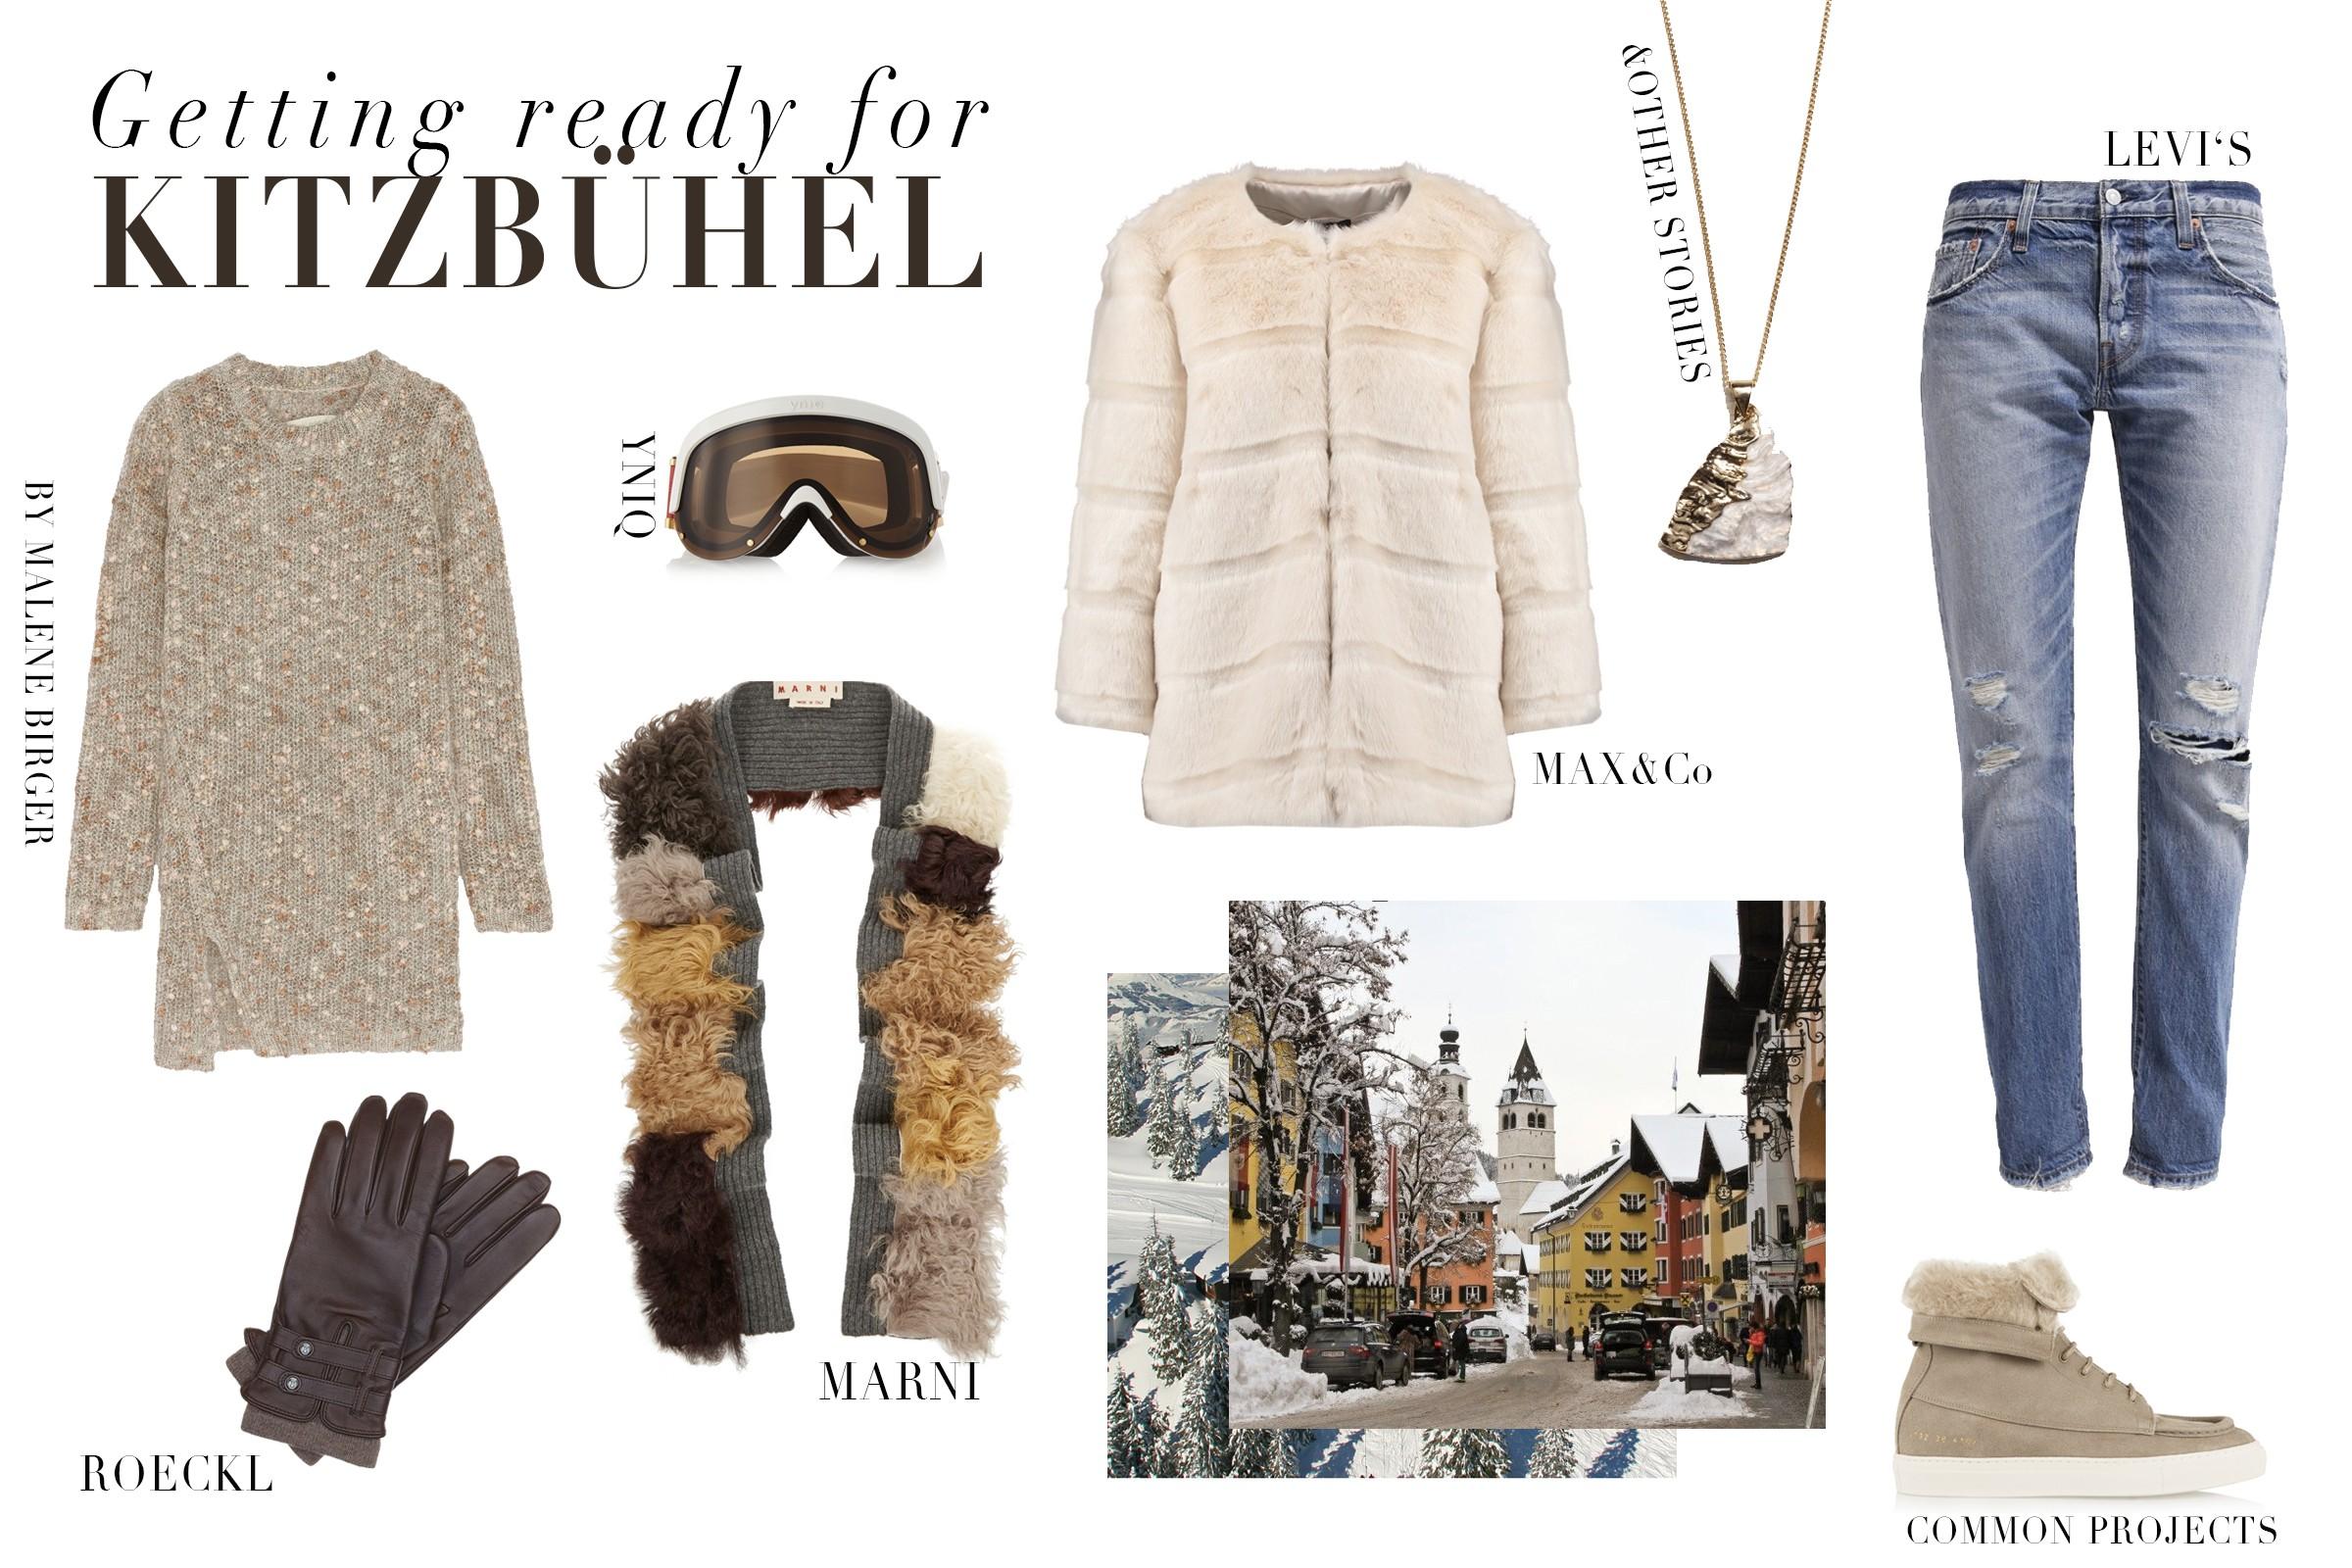 Getting ready for: Kitzbühel